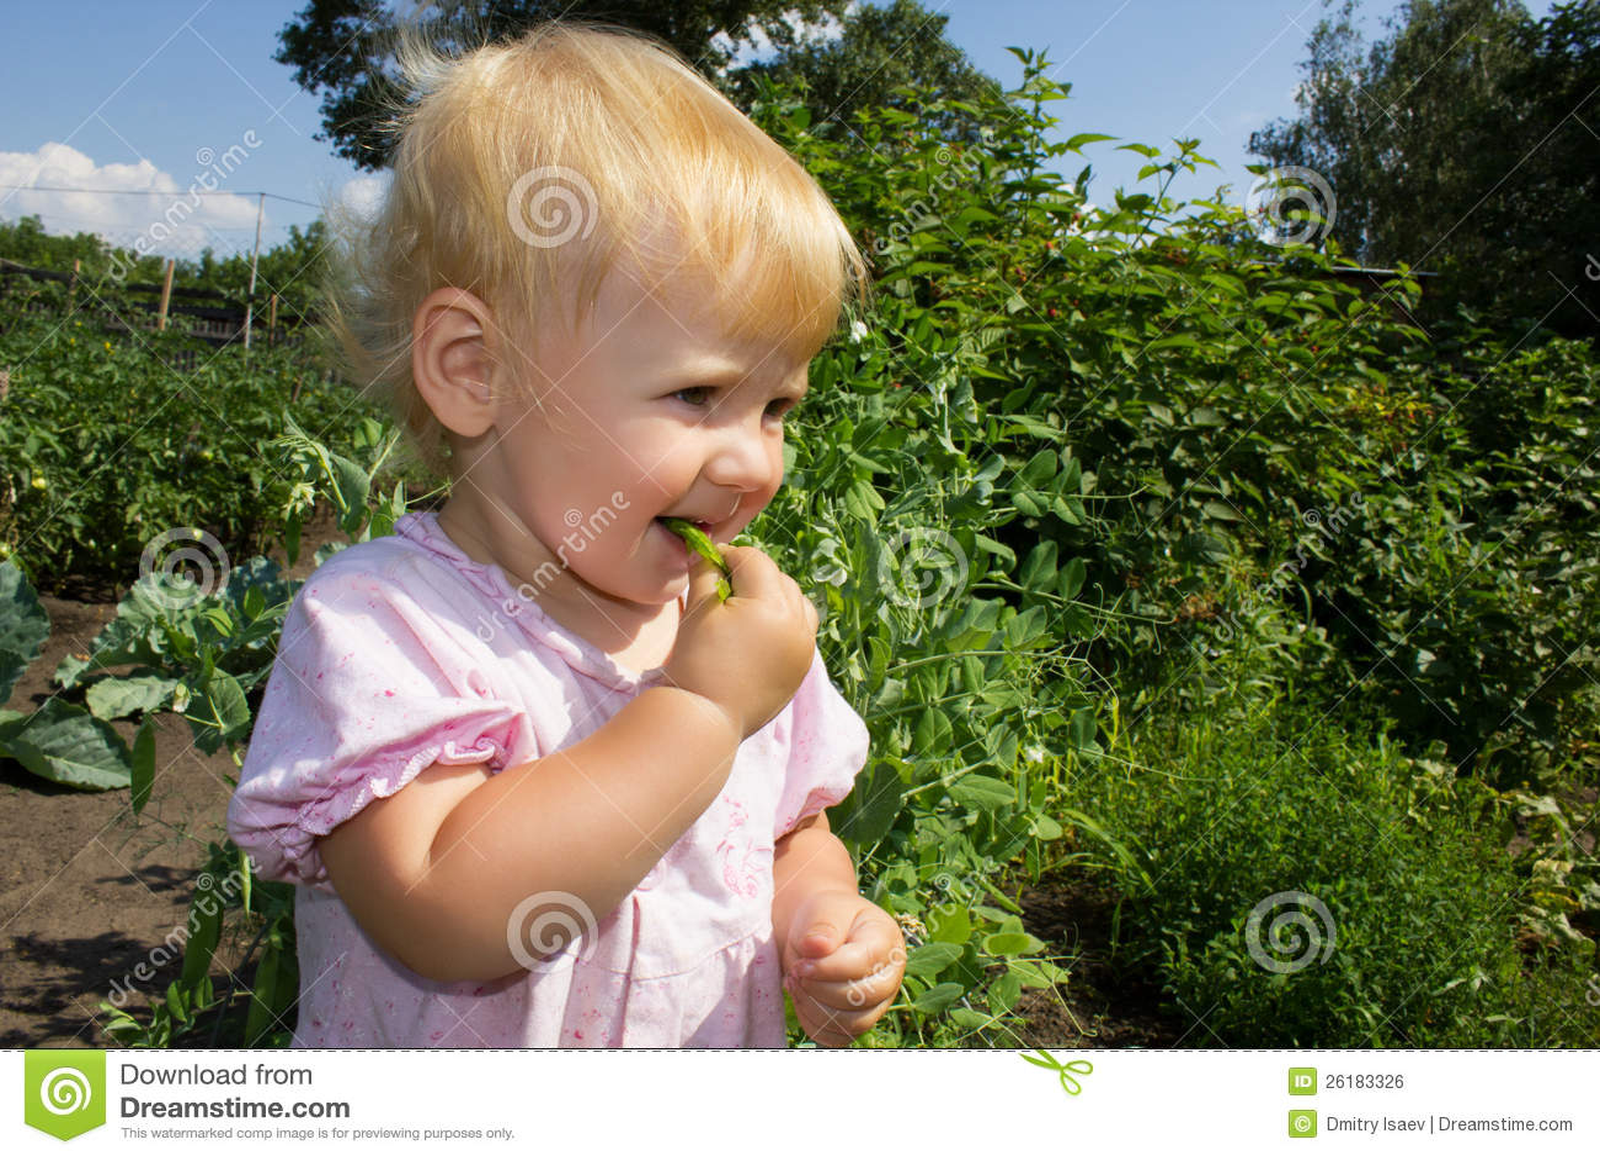 Baby eats peas 4873